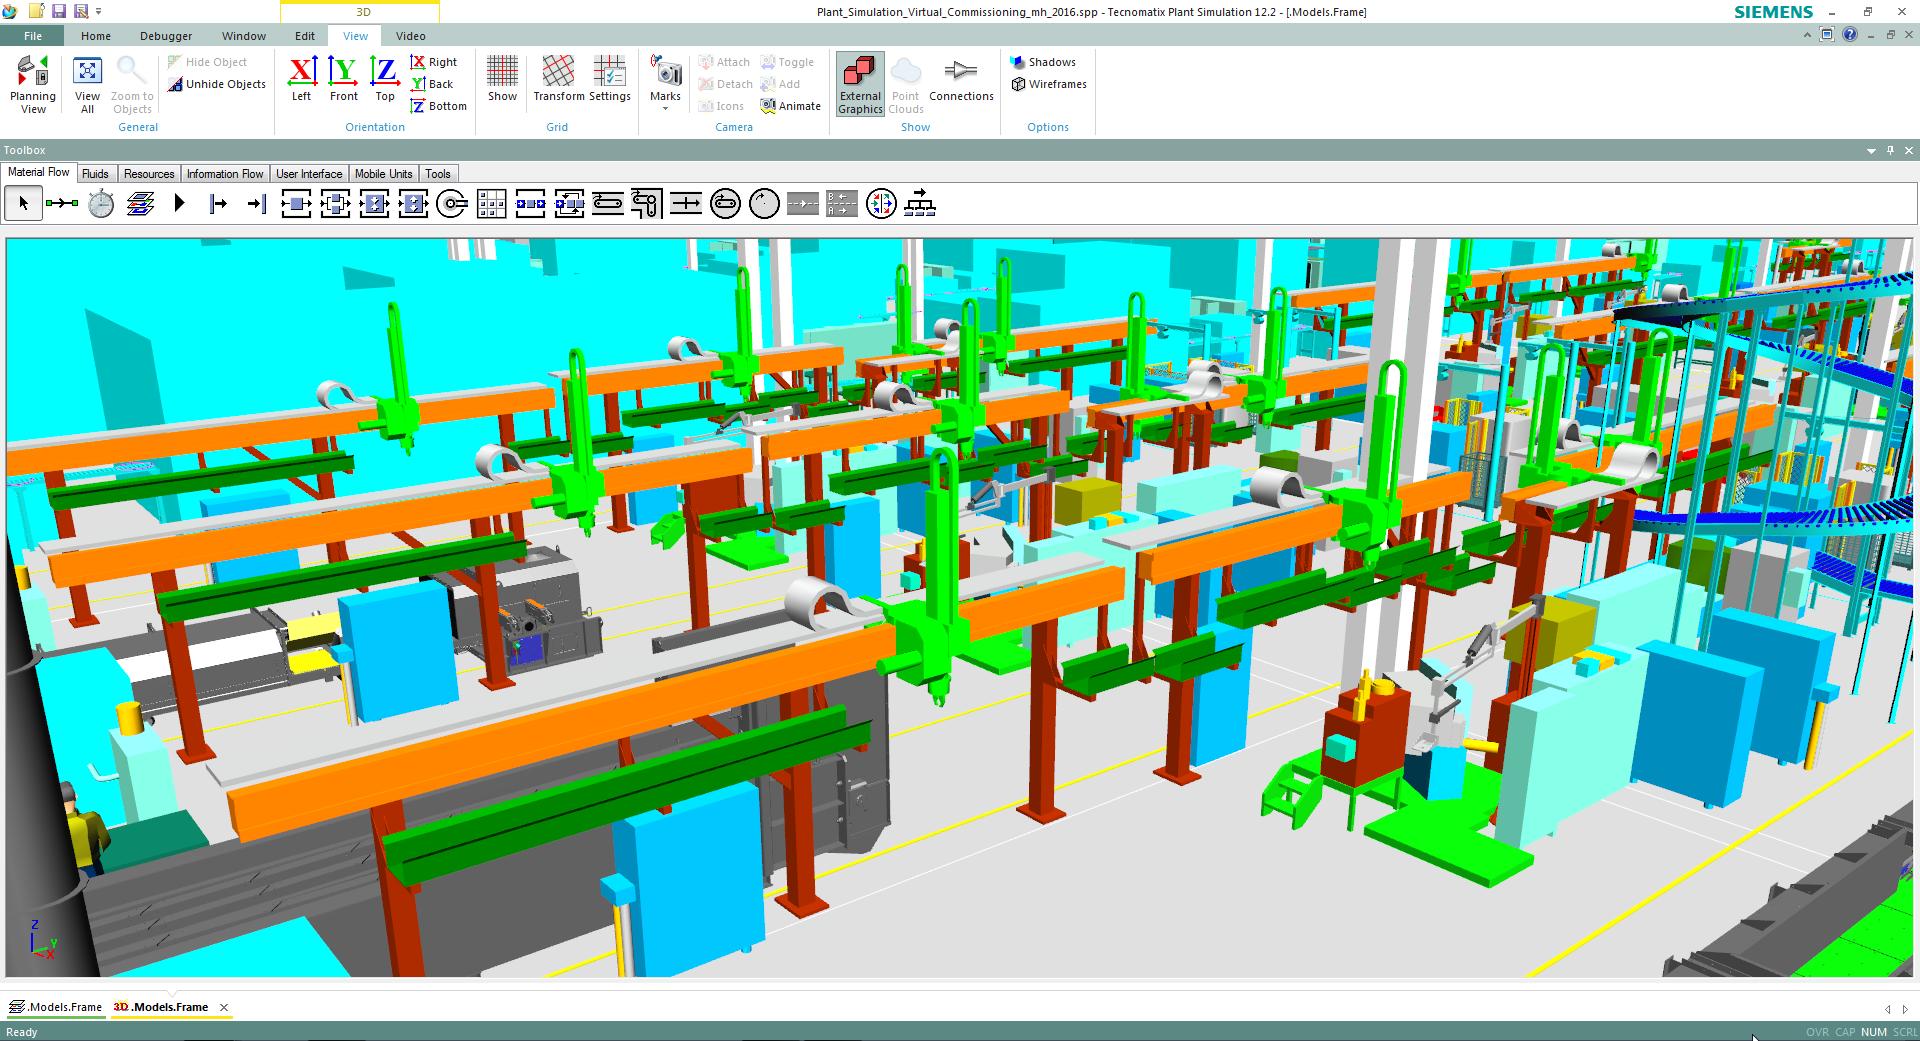 Virtual_Commissioning_Plant_Simulation_02.png